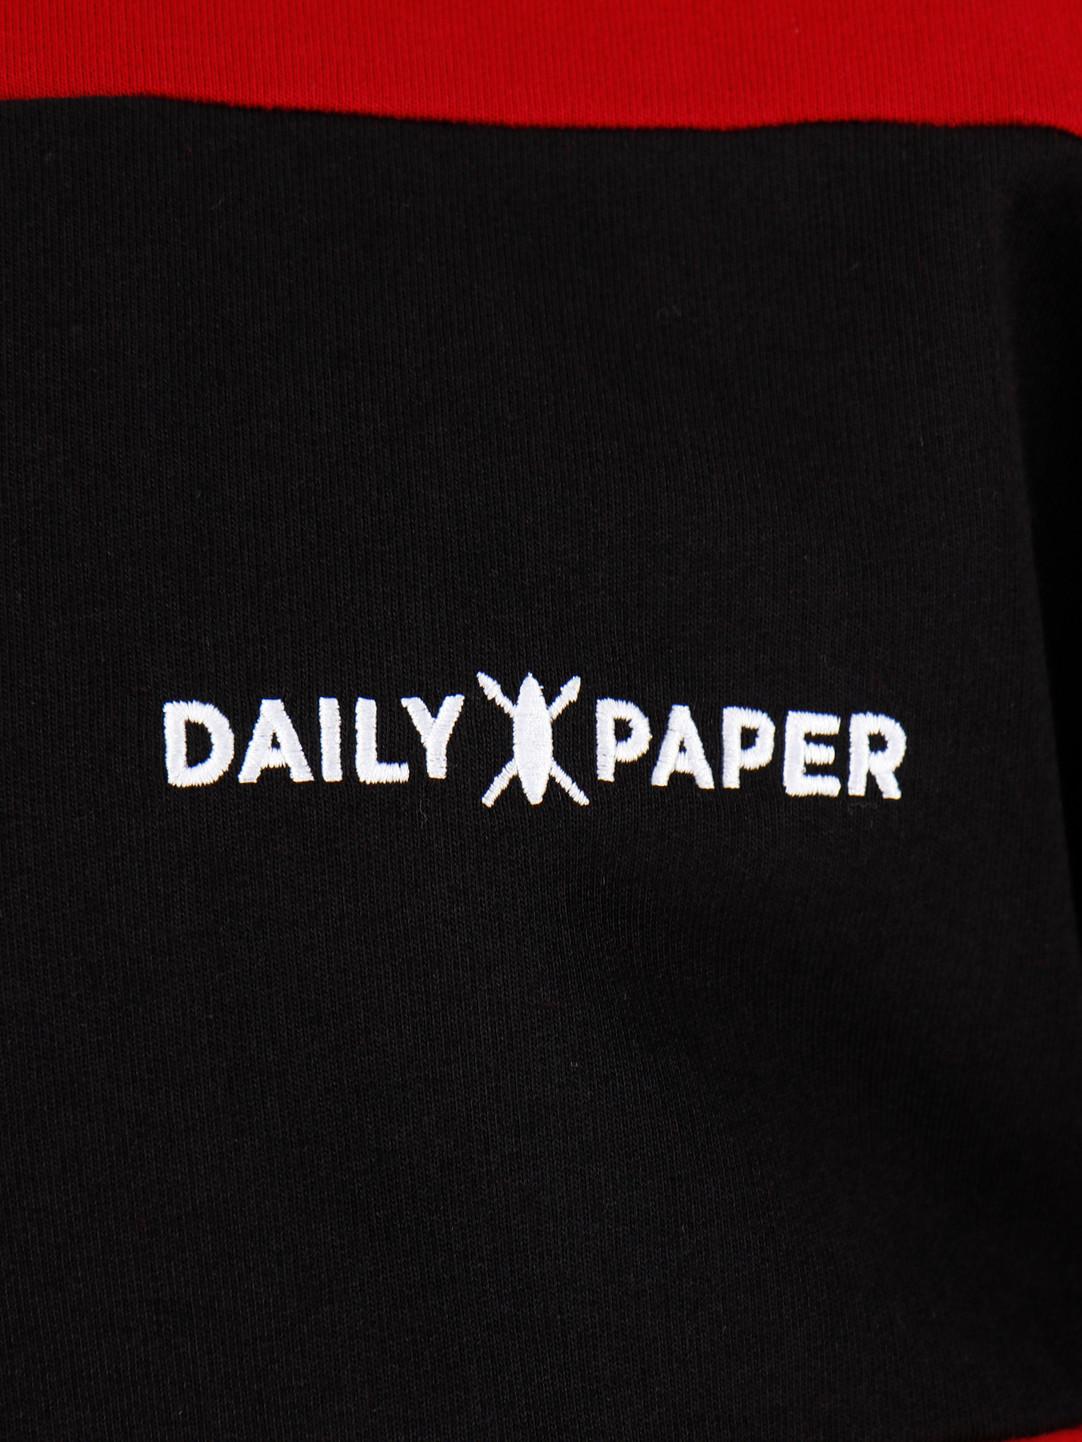 Daily Paper Daily Paper Apolo Black Rio Red White 19E1TO01-02